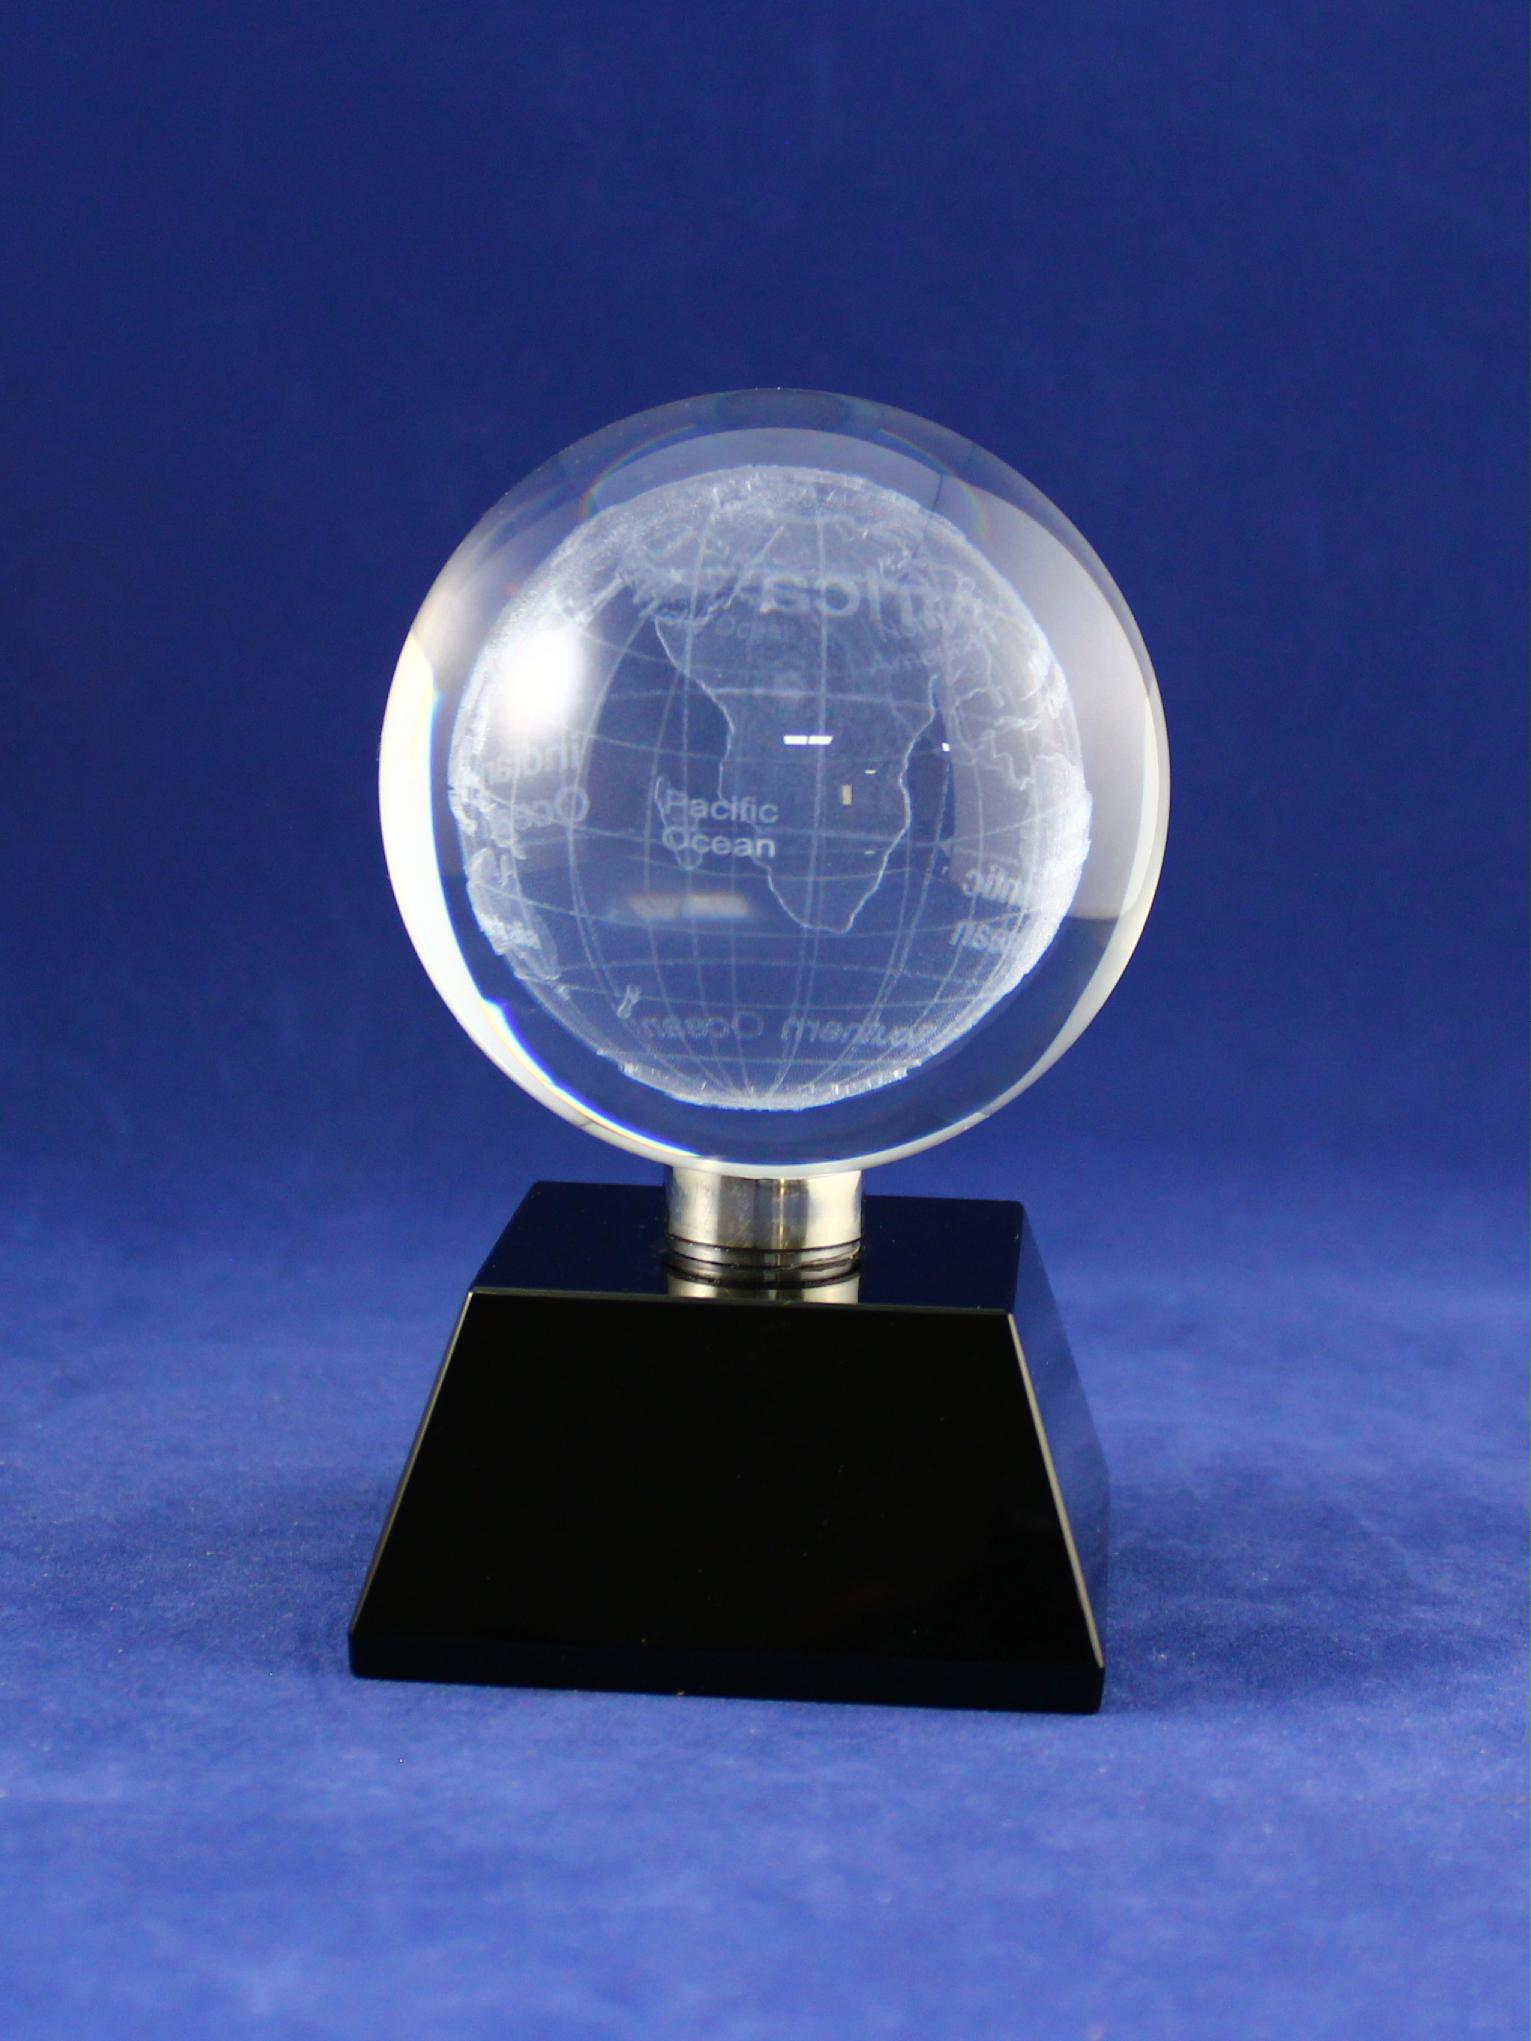 Kristal Ürün Kodu: TVL 3063